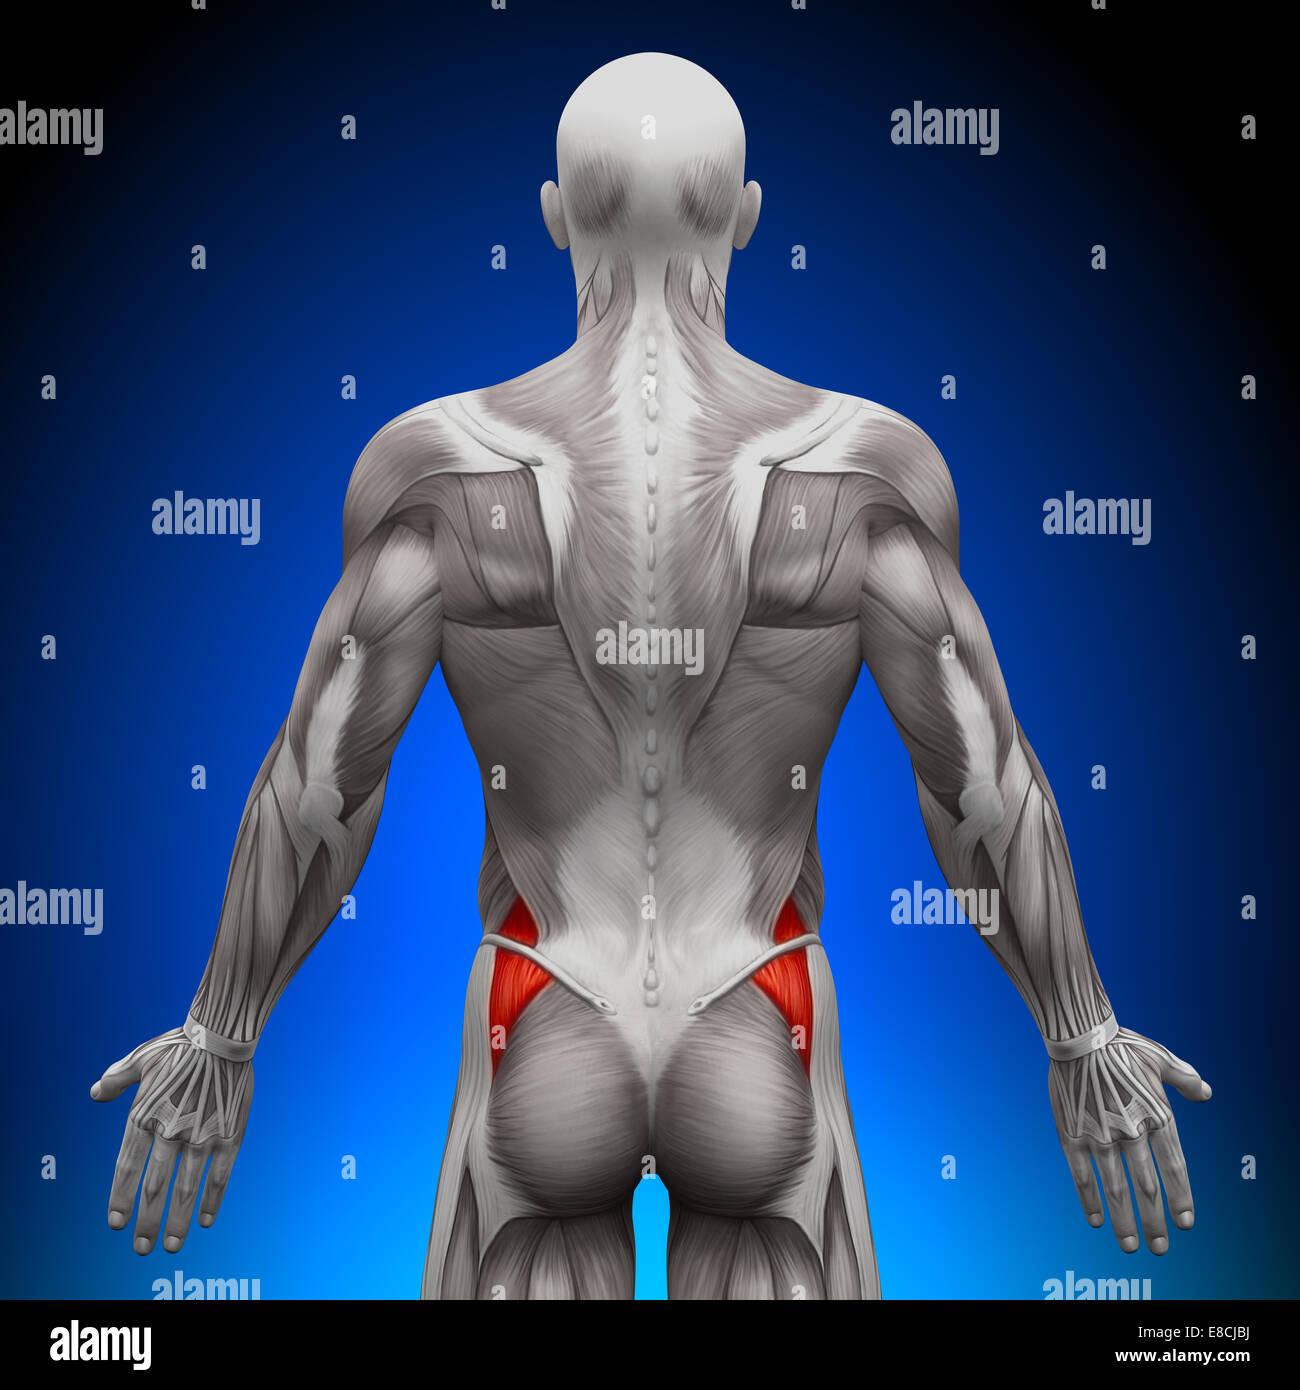 Gluteus Medius - Anatomie Muskeln Stockfoto, Bild: 74036582 - Alamy